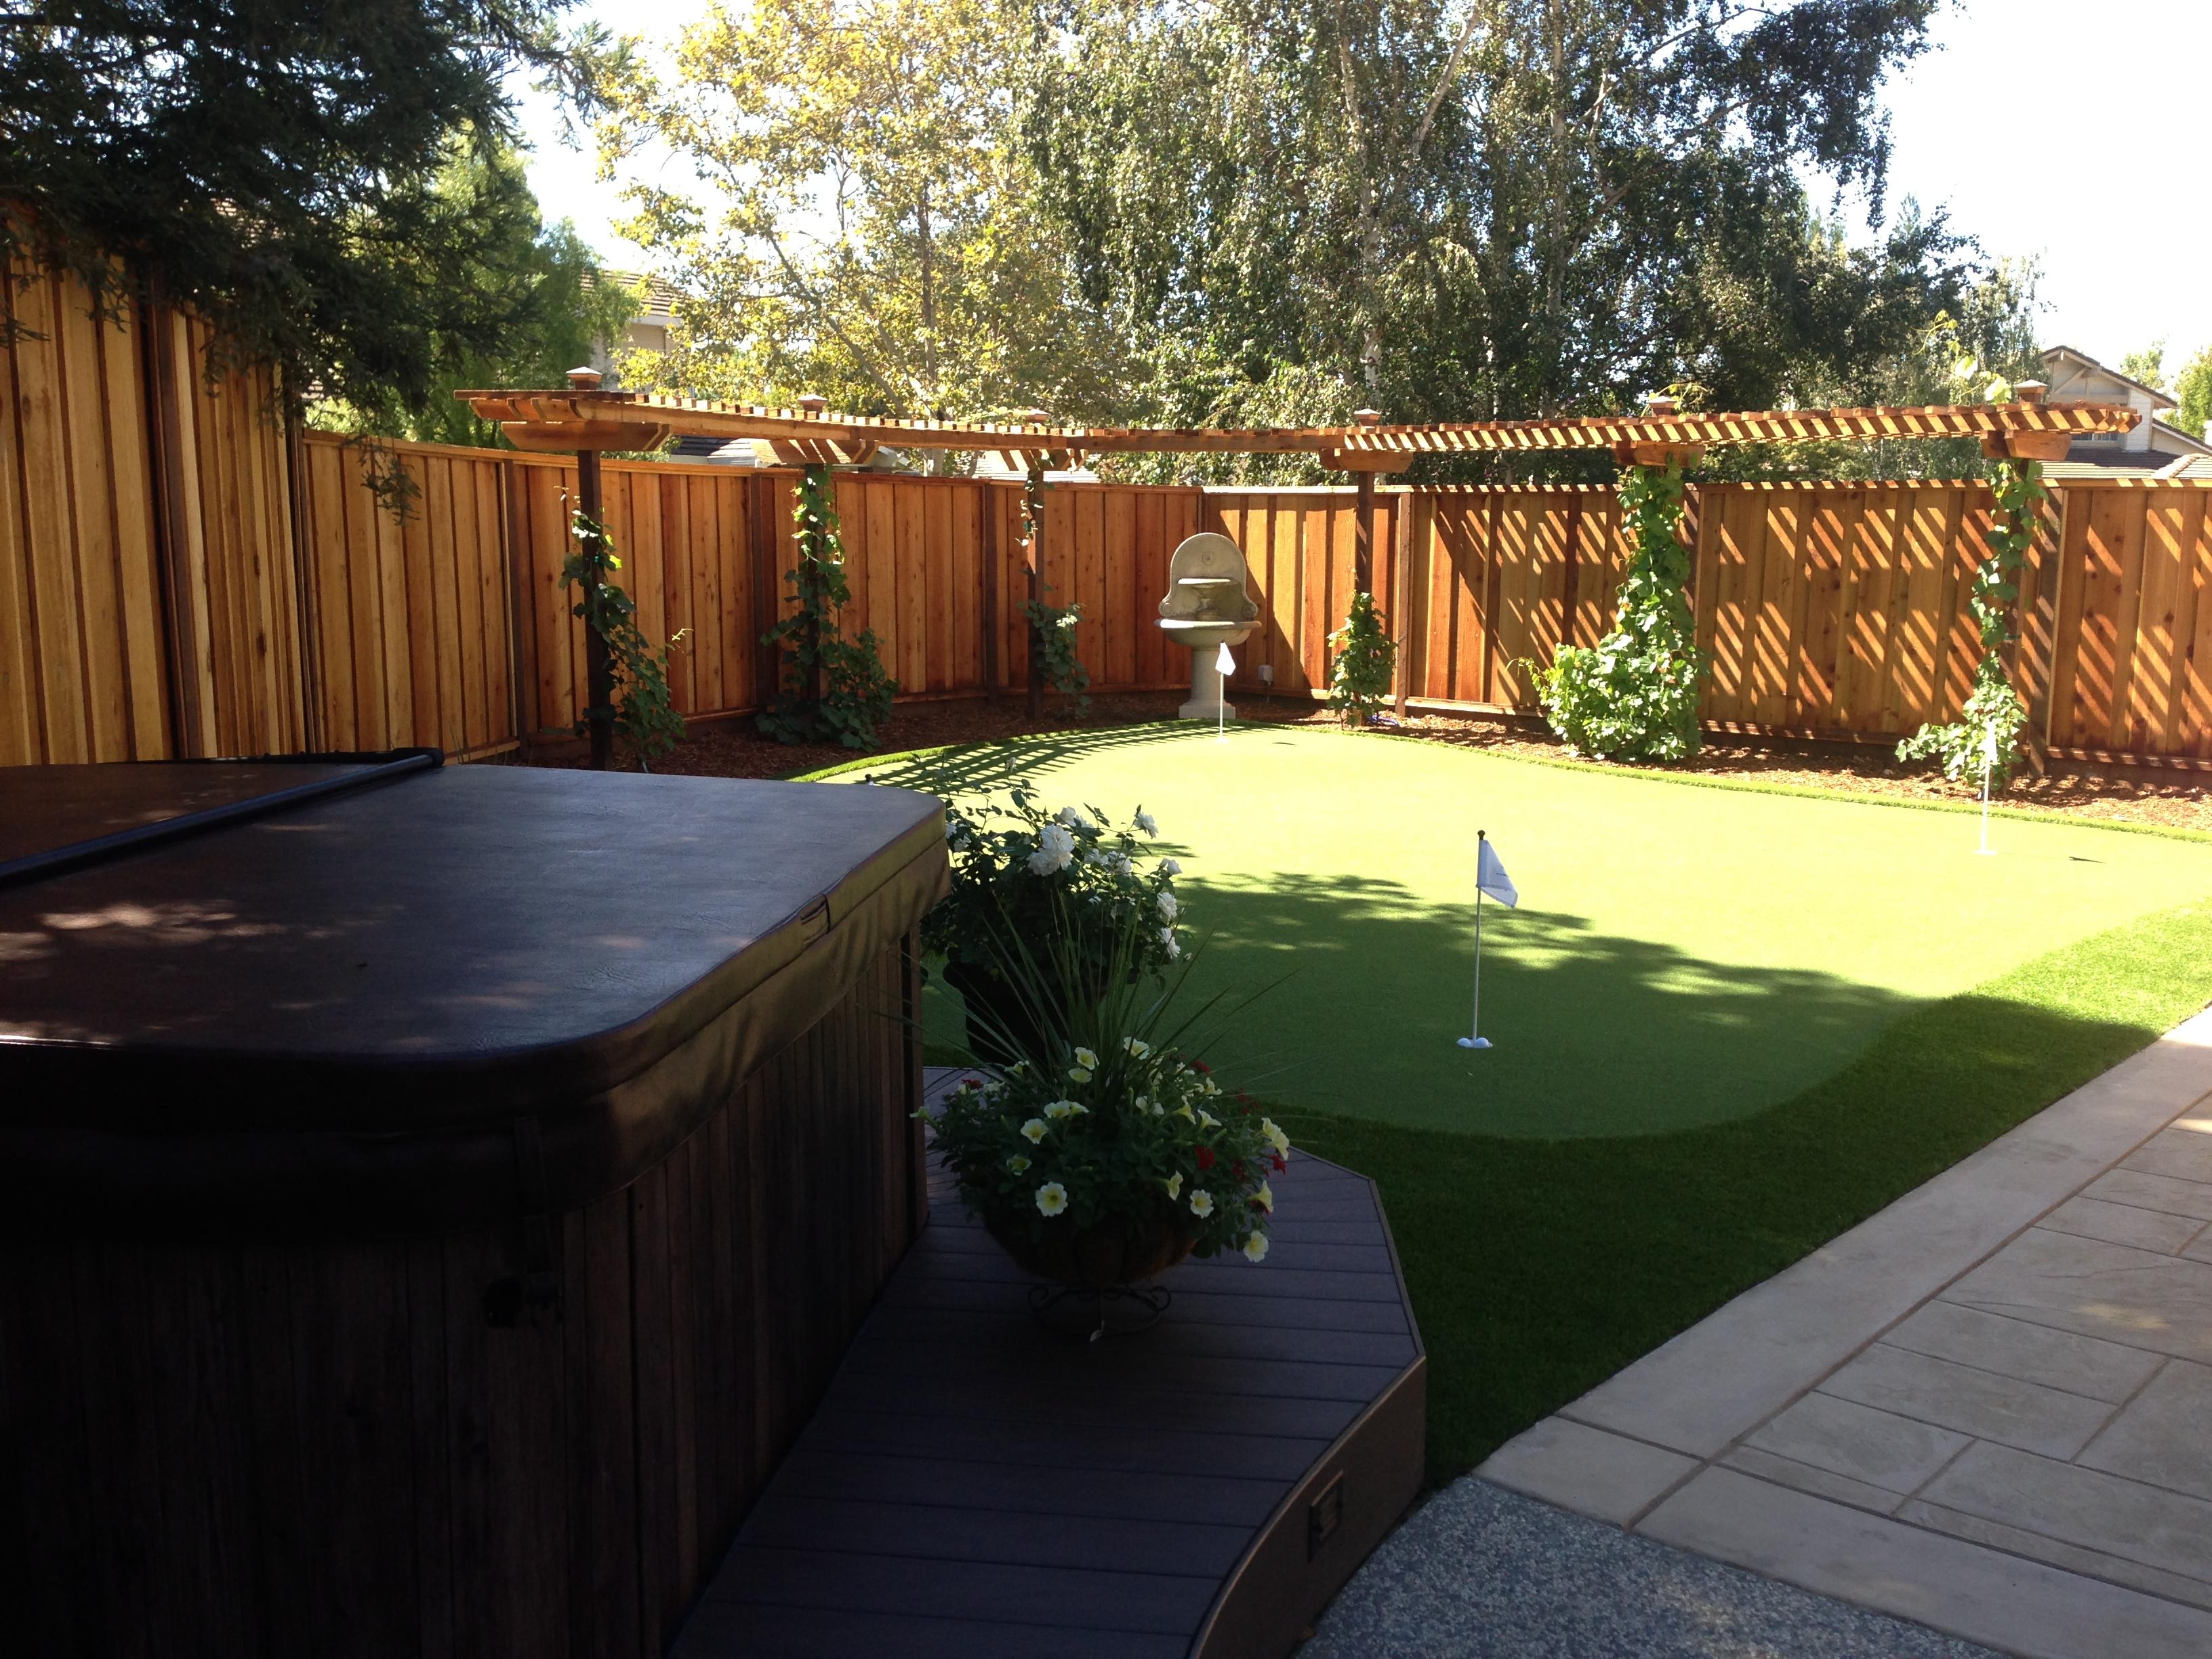 Redwood Fence and Trellis